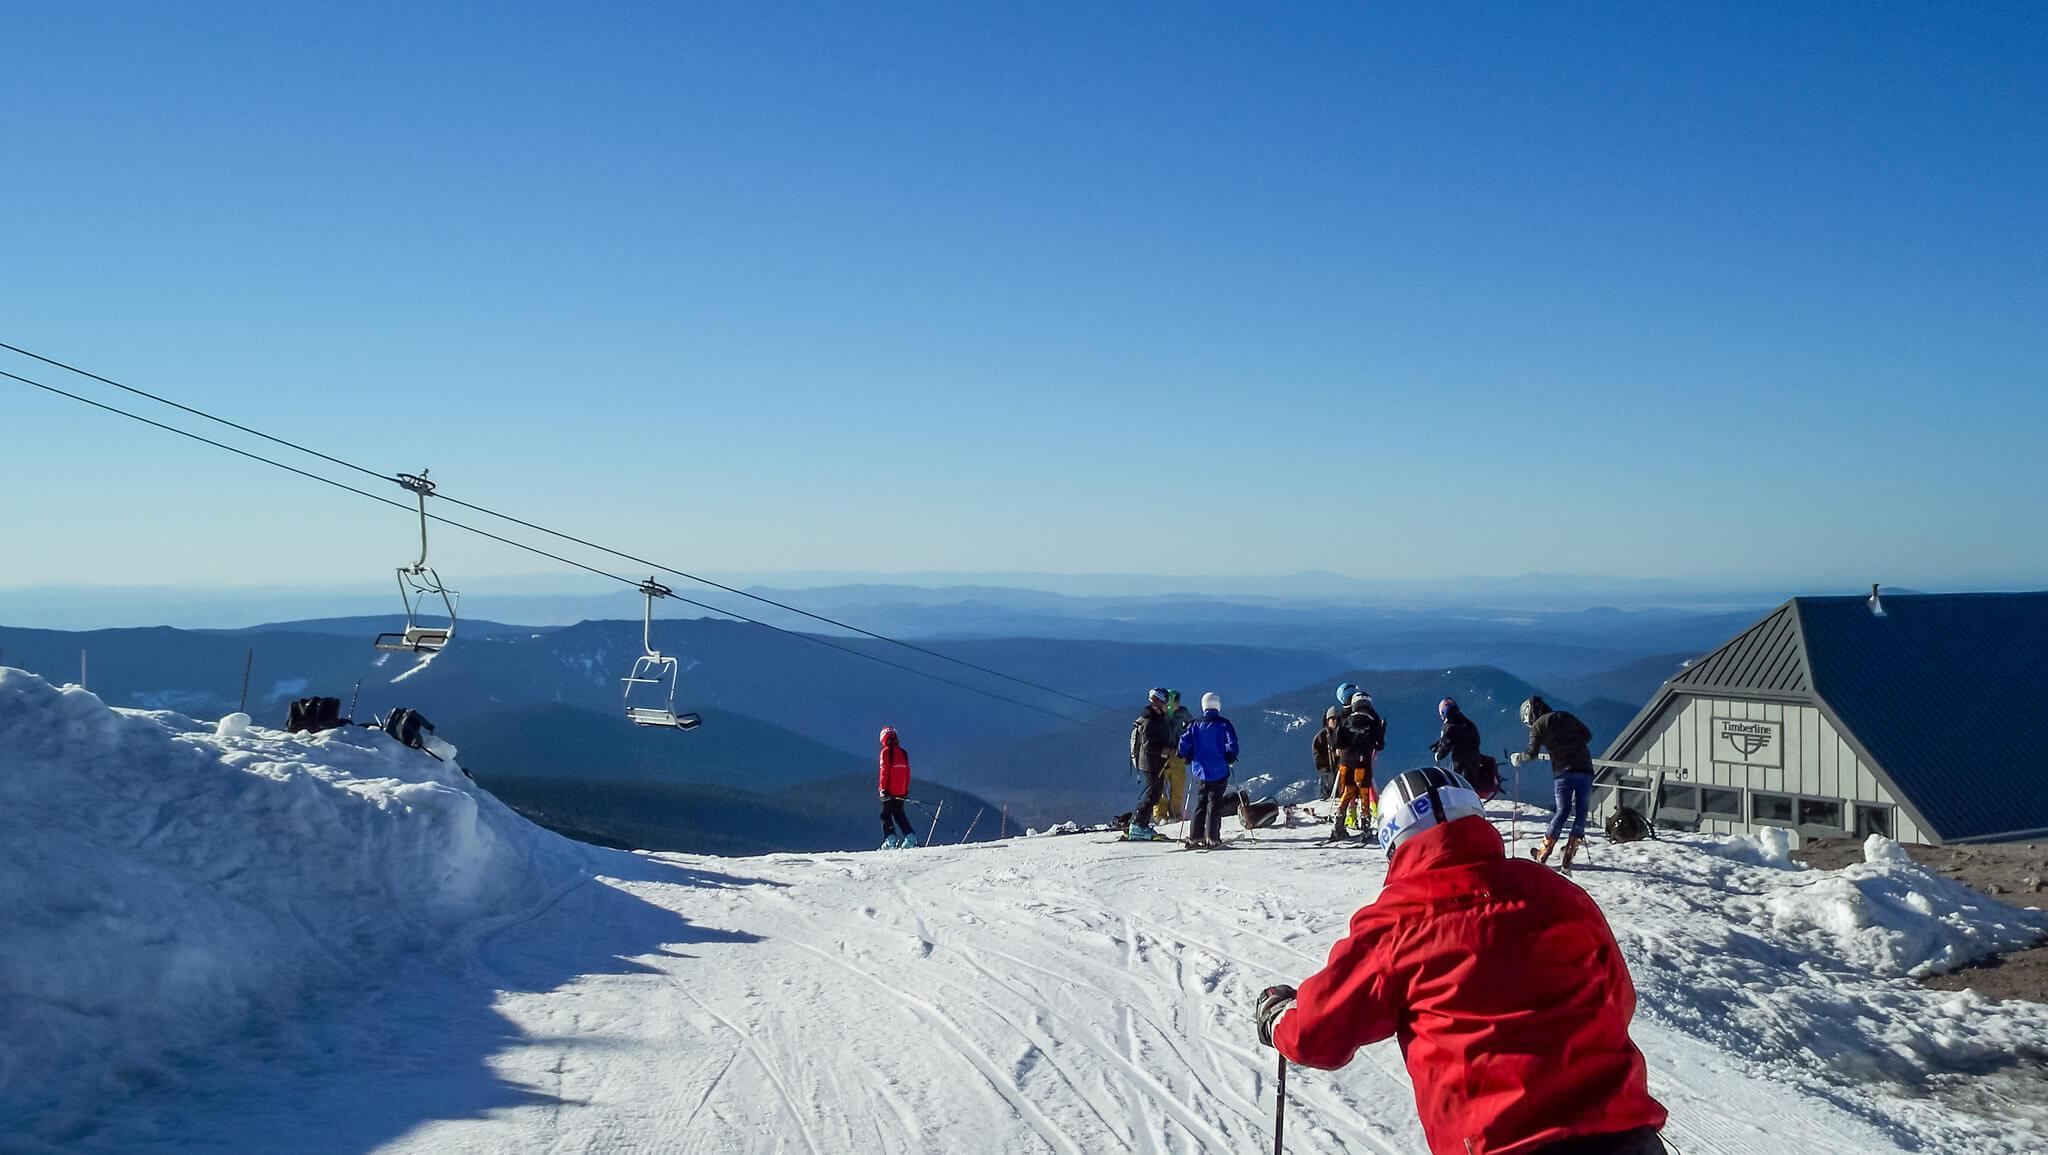 Skiing at Mt. Hood in Oregon